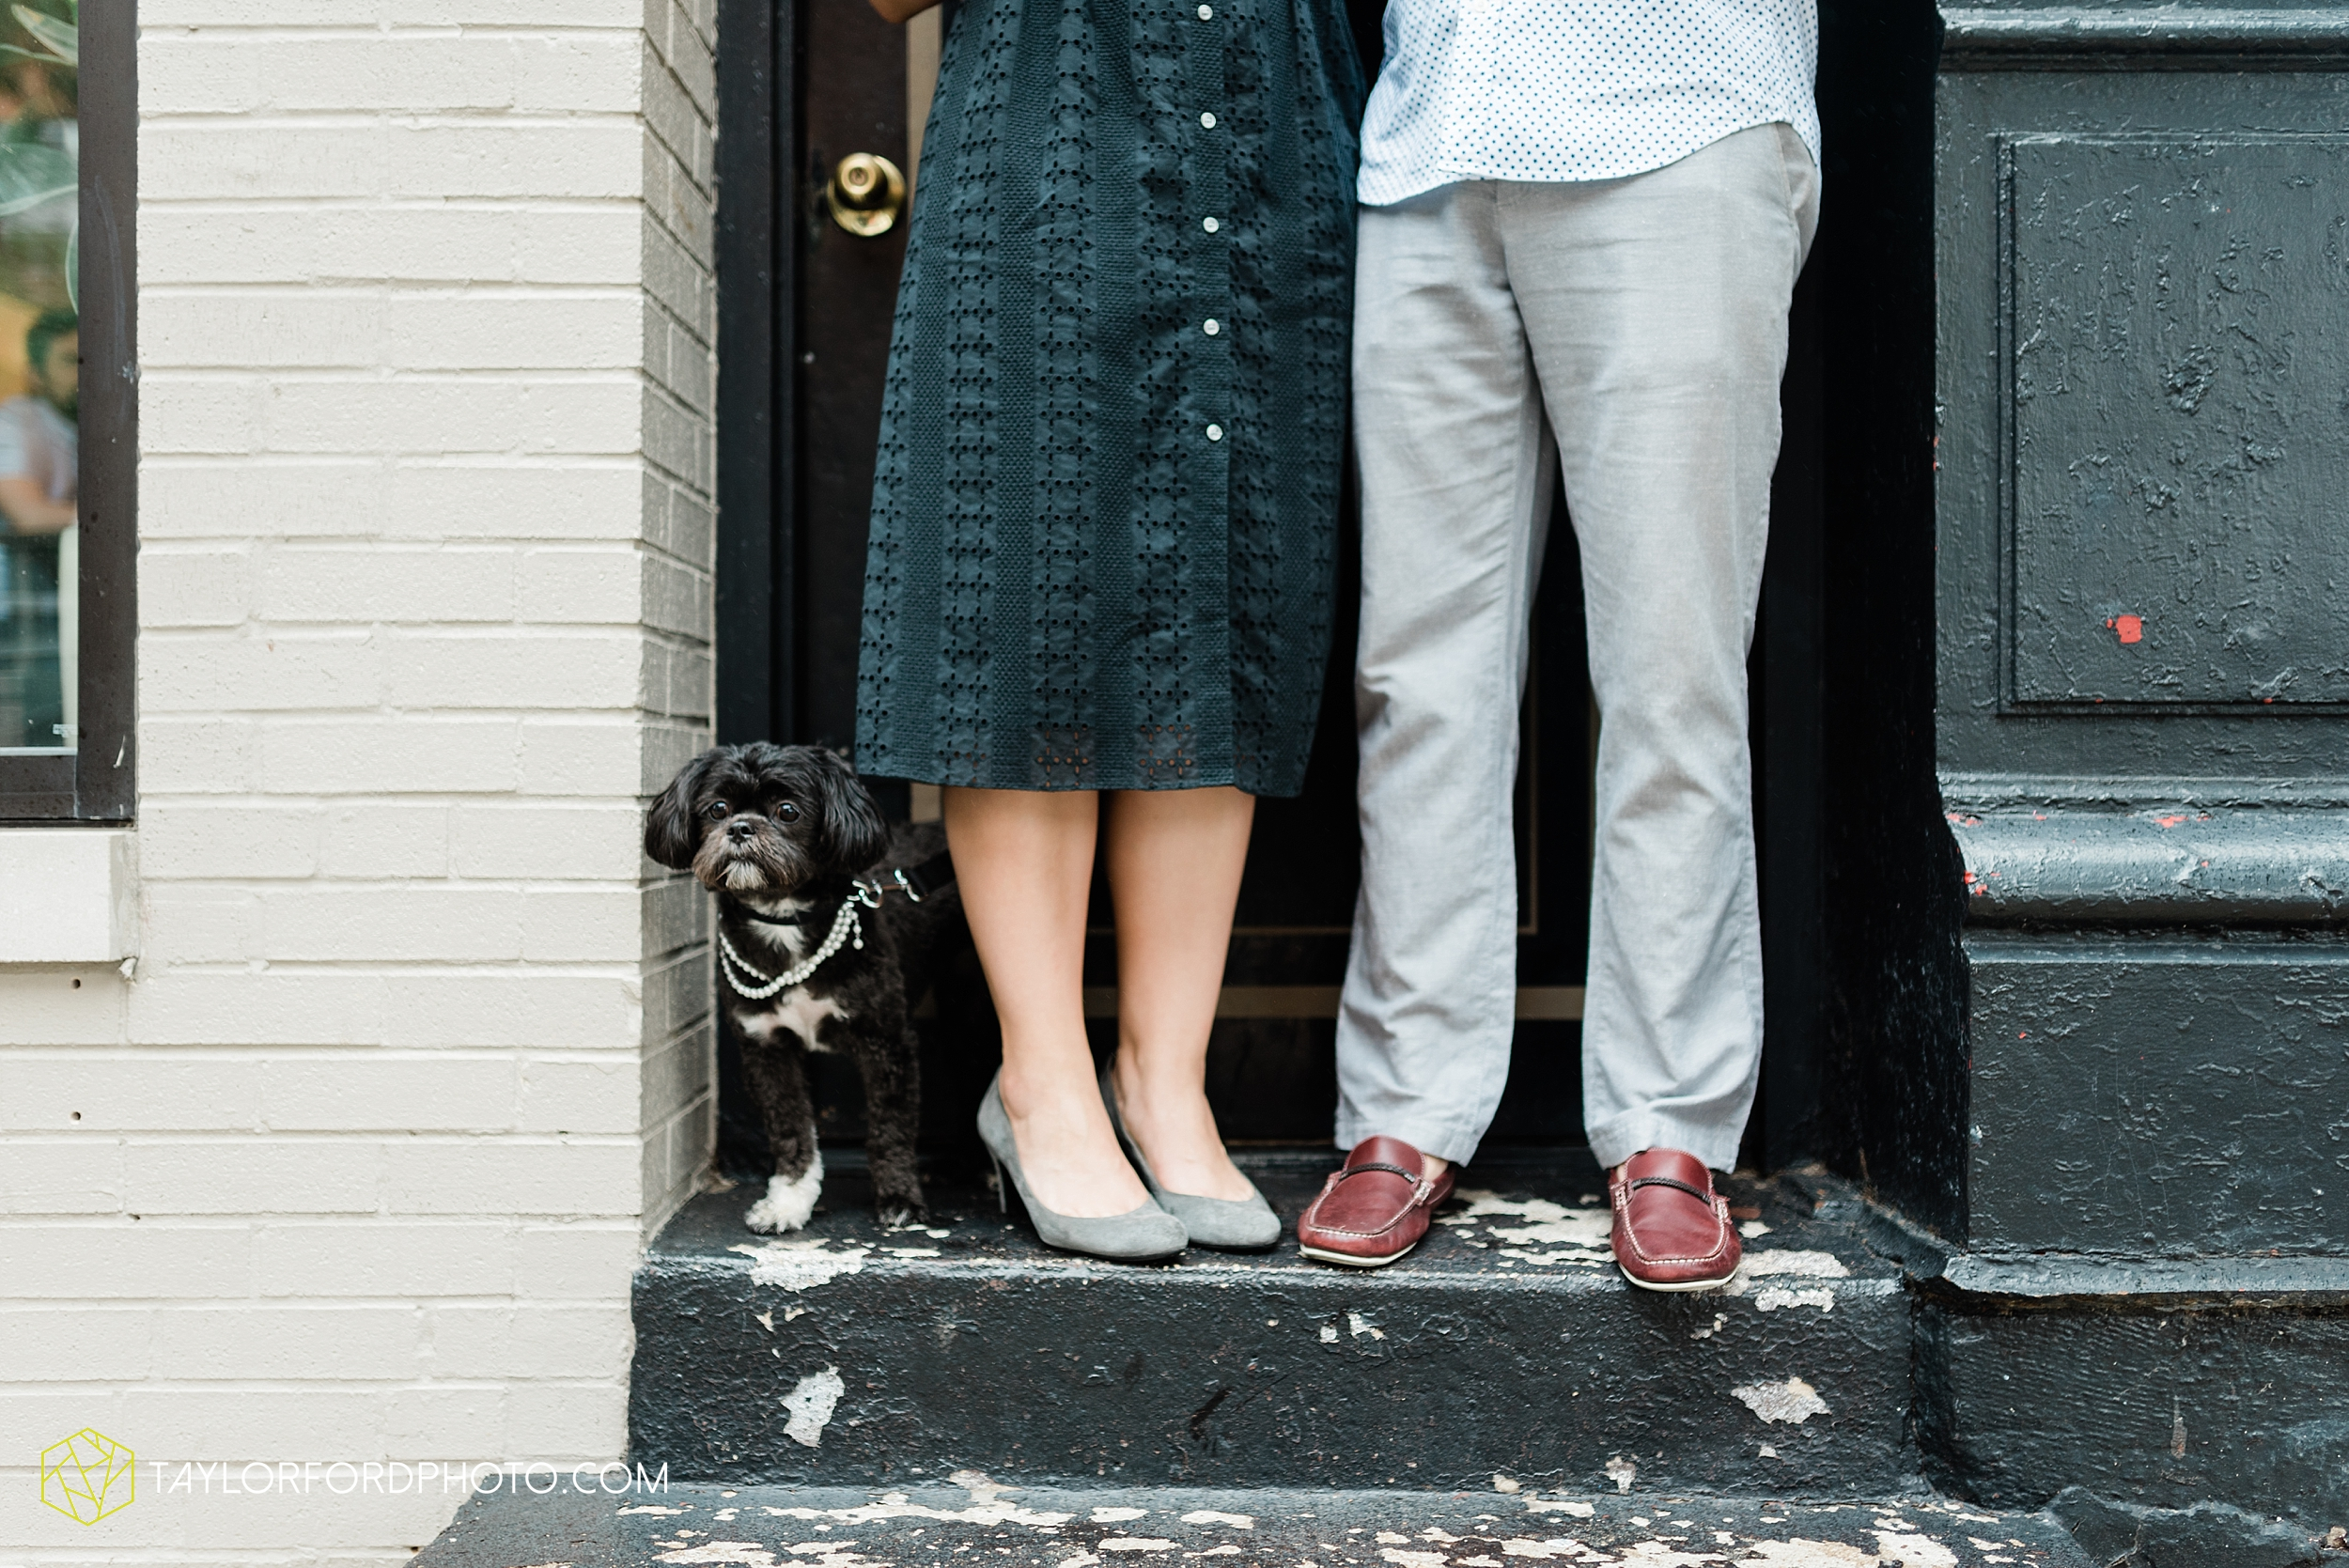 chicago-illinois-ipsento-606-high-line-wicker-park-bucktown-prosecutor-engagement-wedding-photographer-Taylor-Ford-Photography_8690.jpg